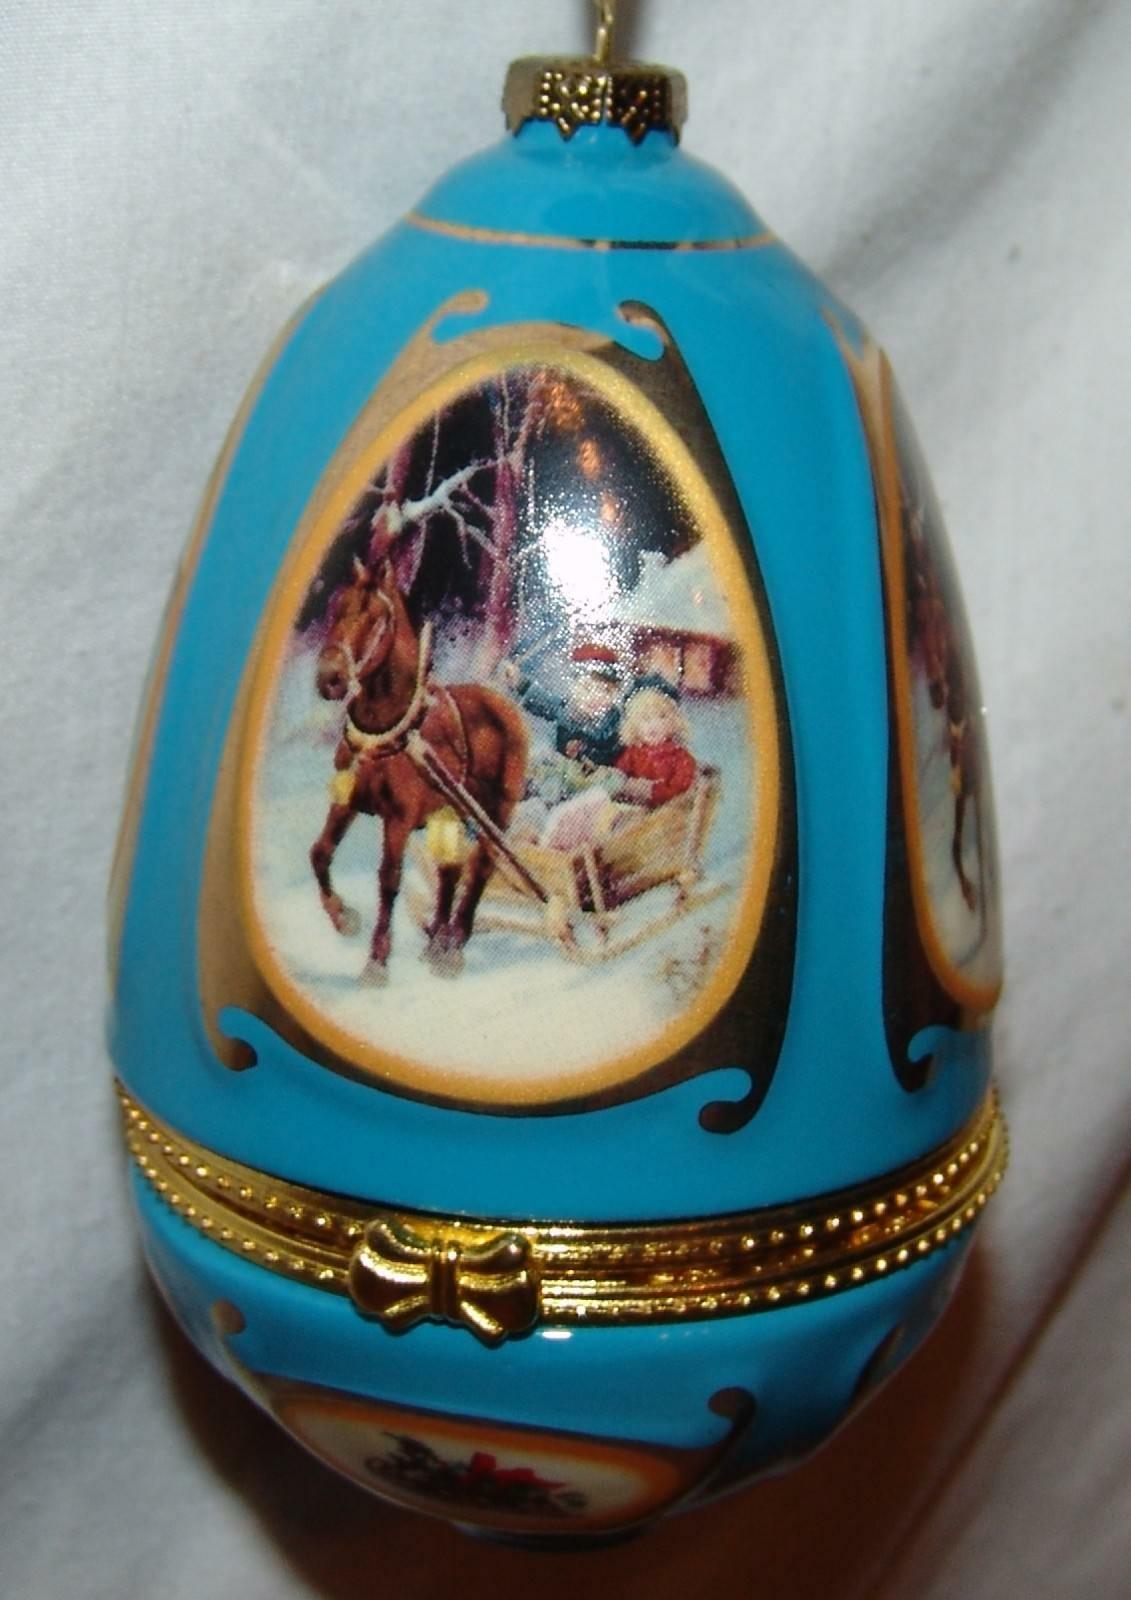 Musical Ornament Trinket Box Egg Christmas Sleigh Ride Blue Winter Snow